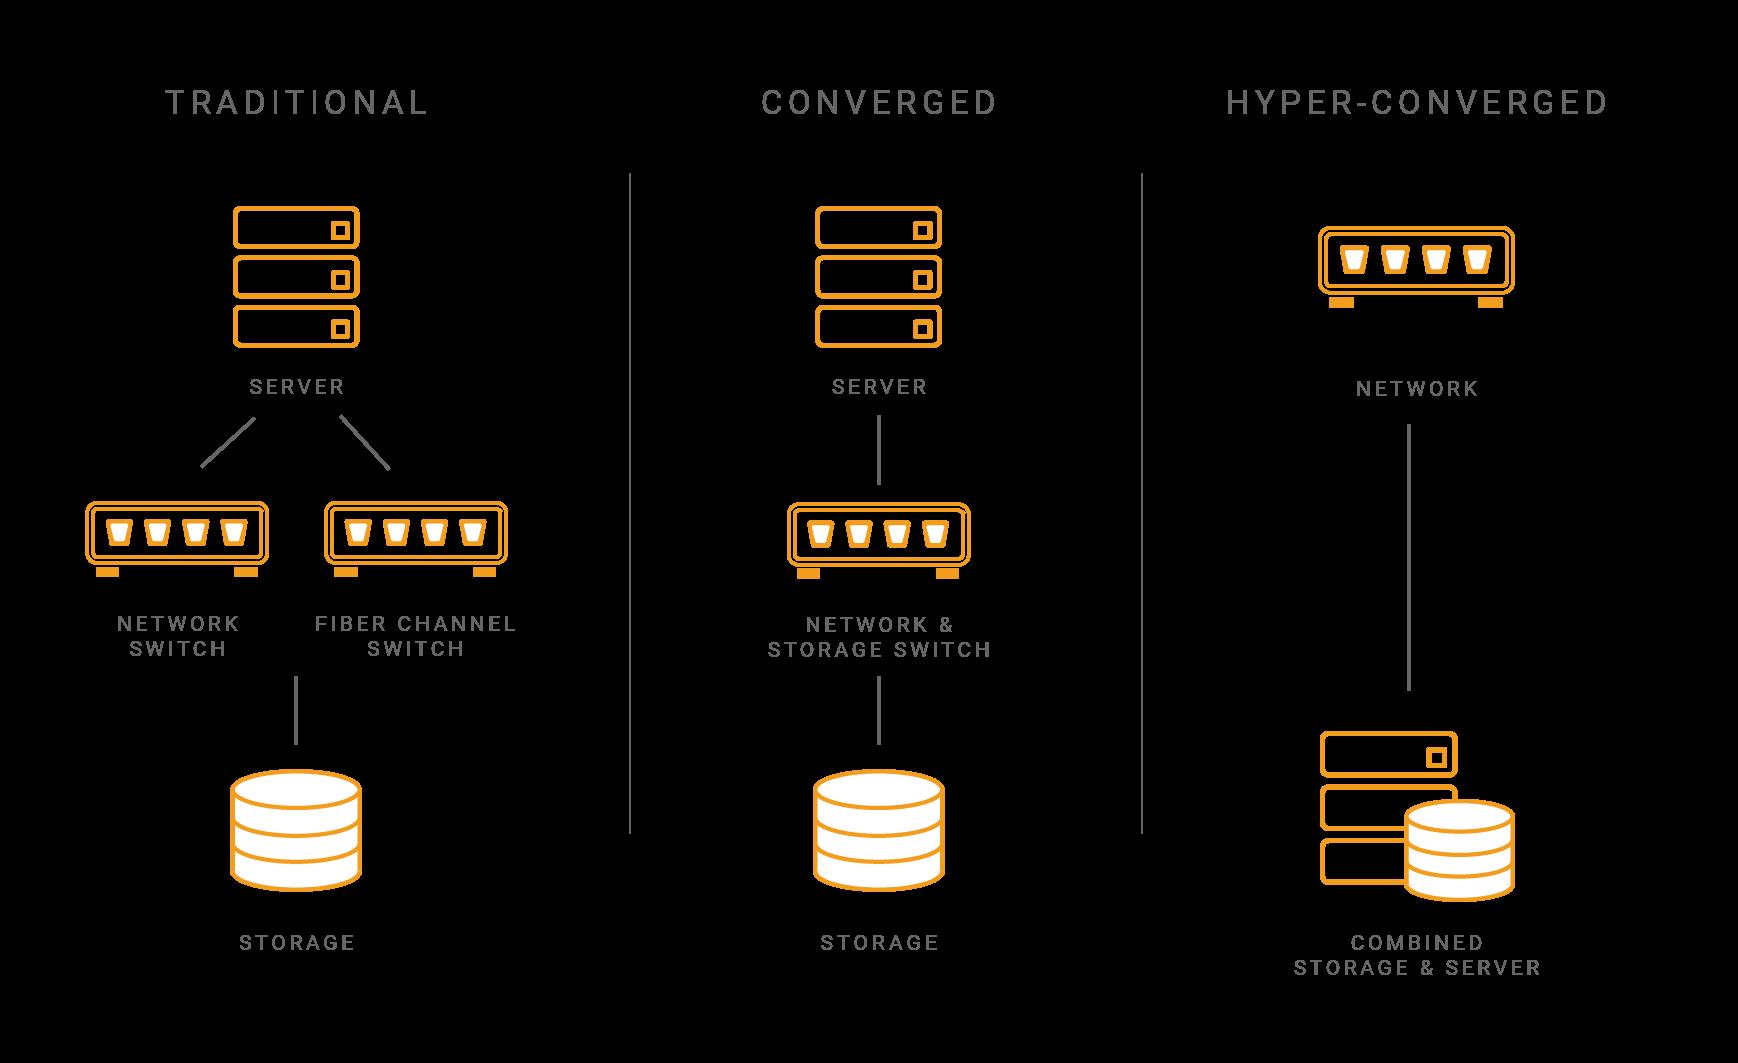 Hyper-convergence storage infographic